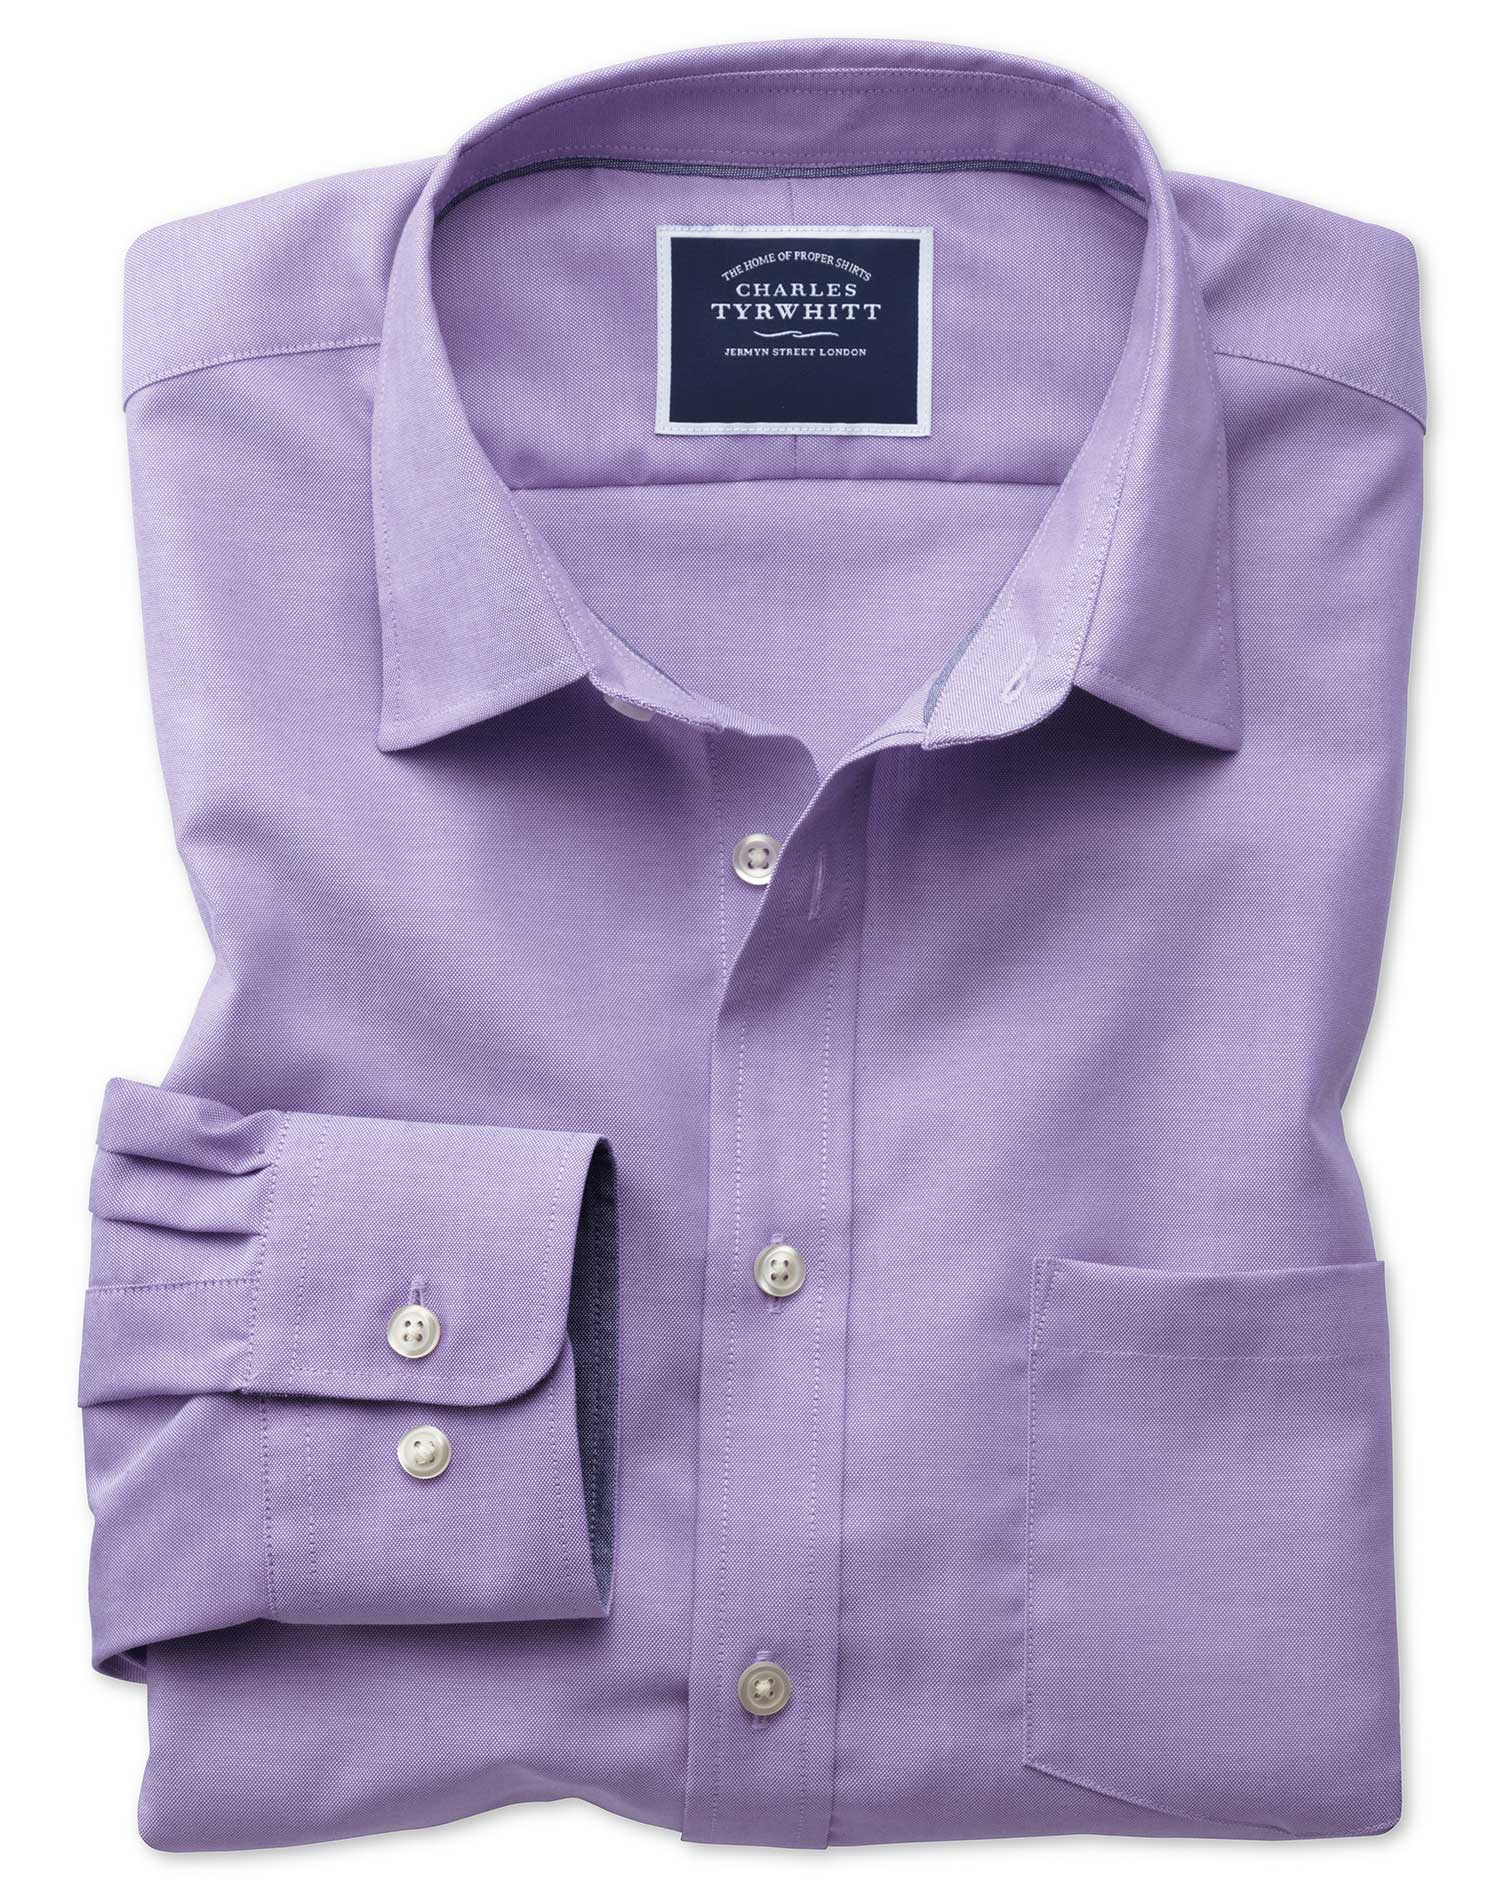 Slim Fit Non-Iron Oxford Purple Plain Cotton Shirt Single Cuff Size XL by Charles Tyrwhitt